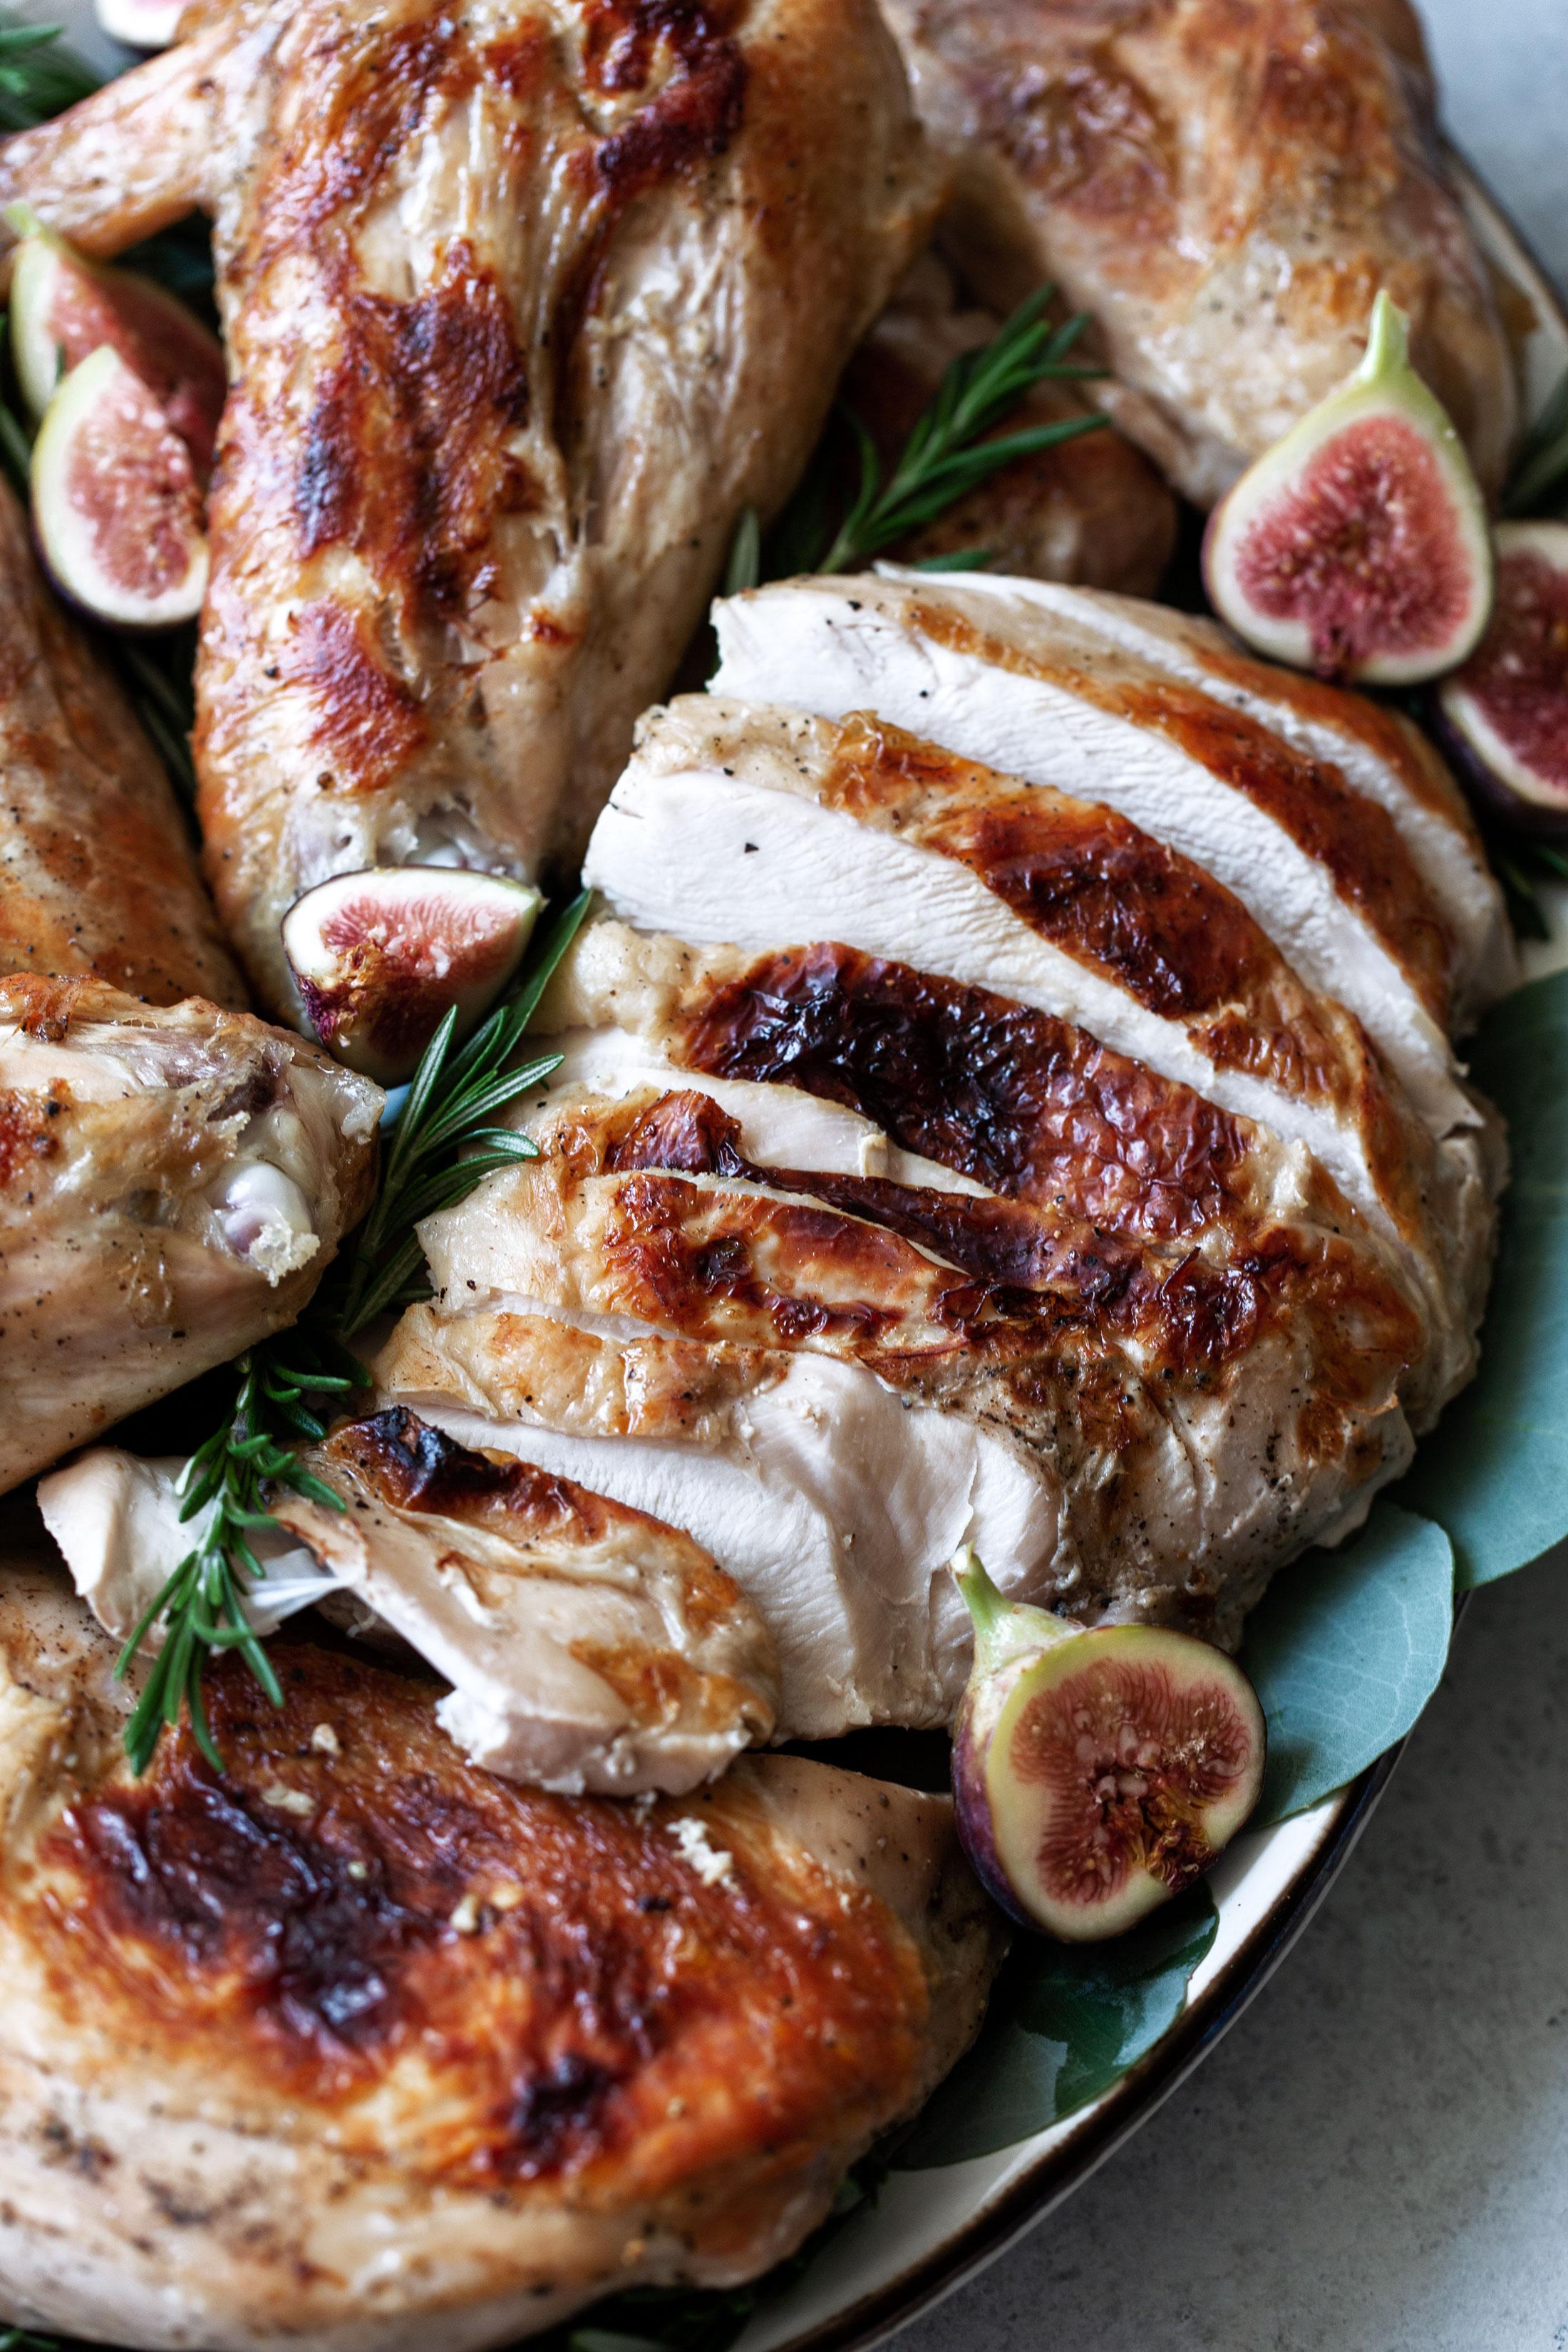 Lemon Rosemary Sous-Vide Turkey with White Wine Gravy recipe from sous-vide magazine closeup